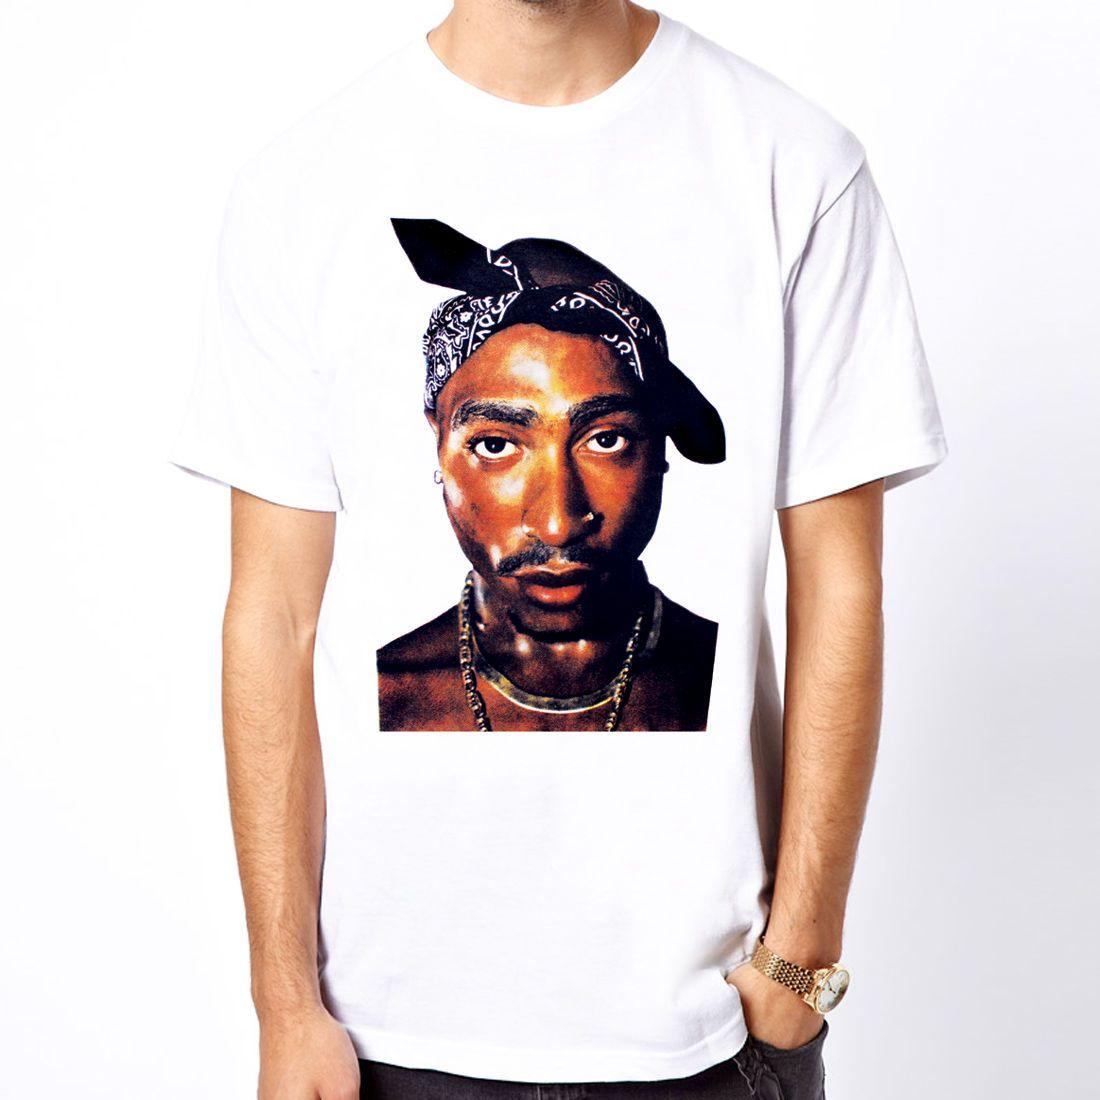 tupac bandana 2pac tribute hip hop rap wu tang cele photo men white